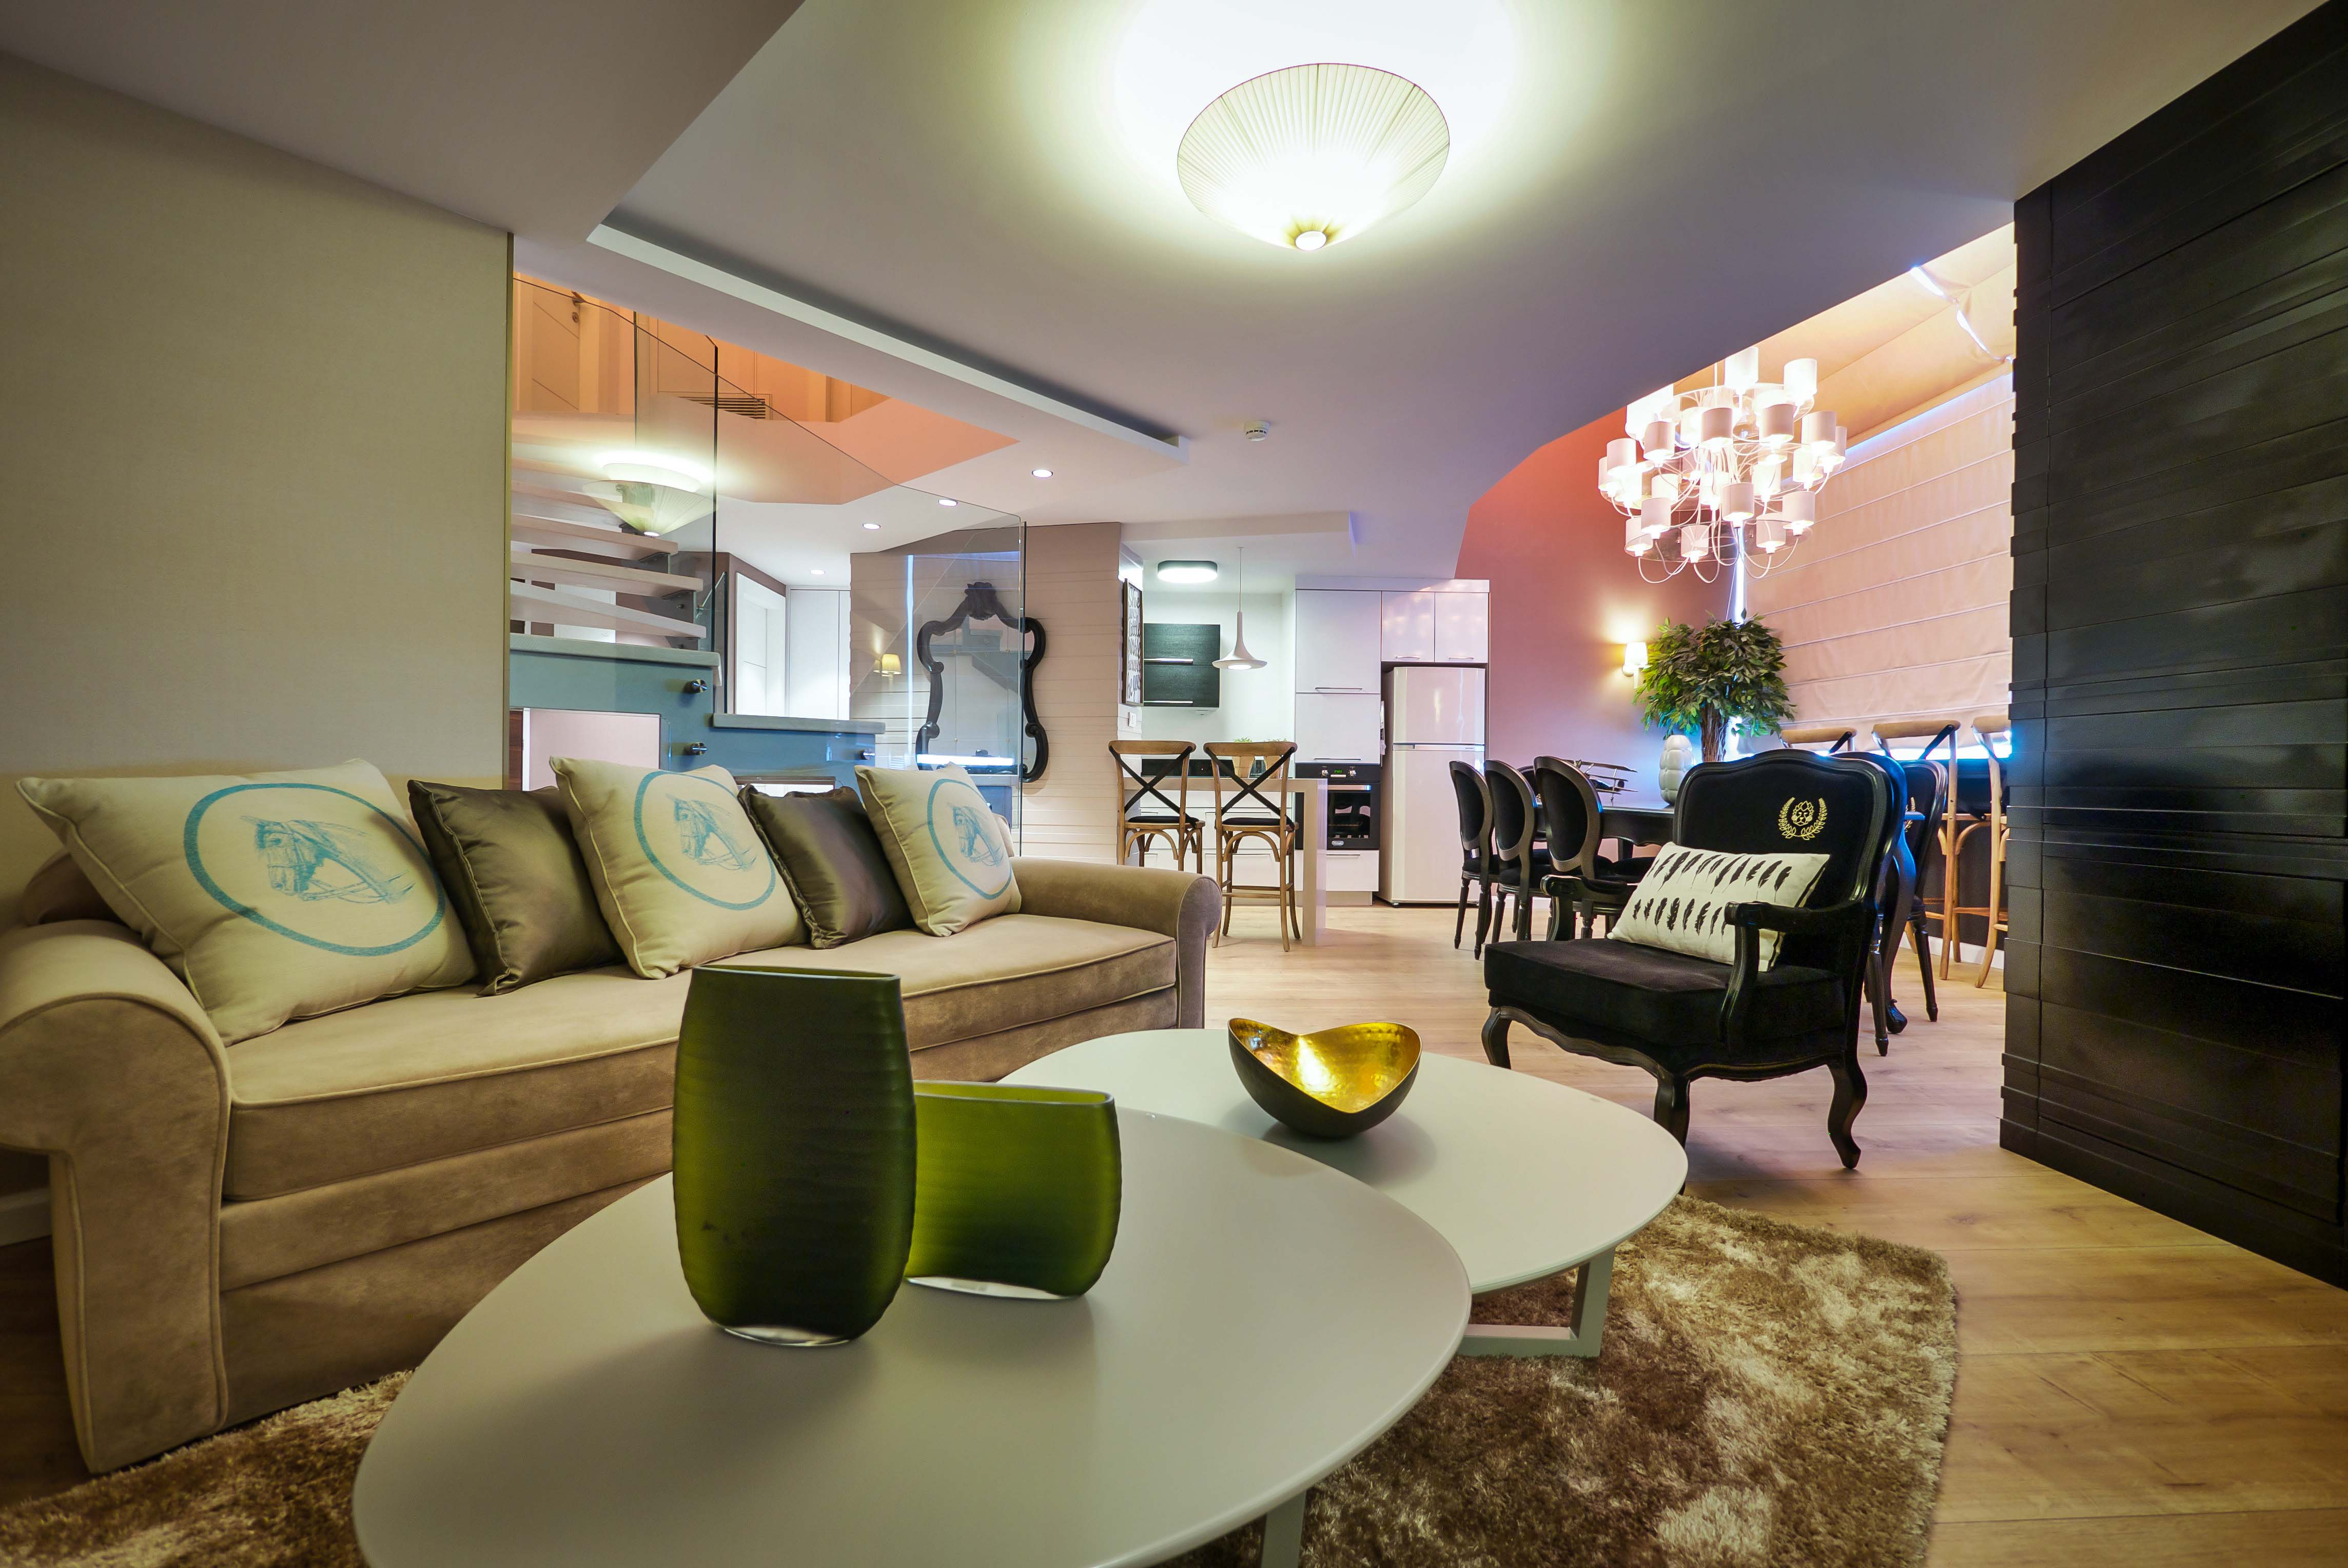 21st Floor Suit Hotel Boutique Hotels In Jerum